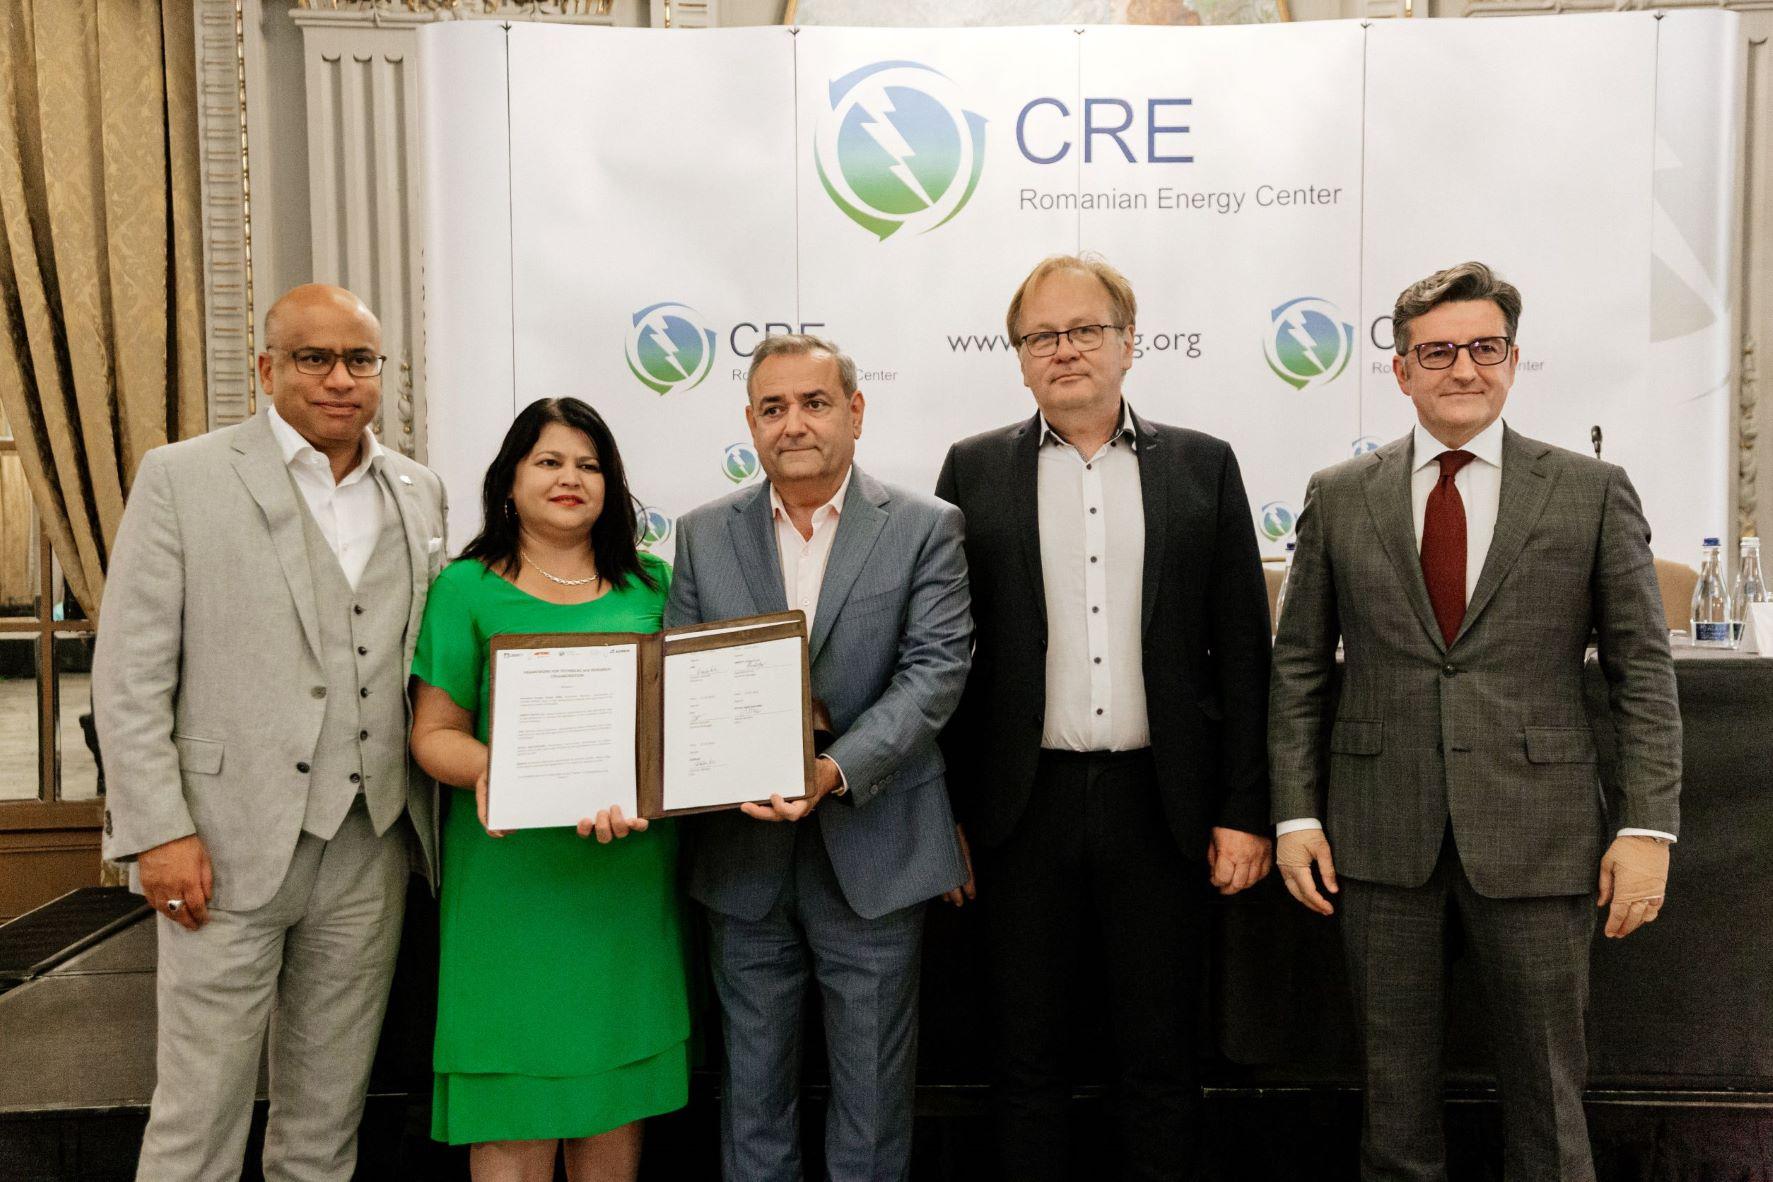 CRE, semnate acord cercetare hidrogen